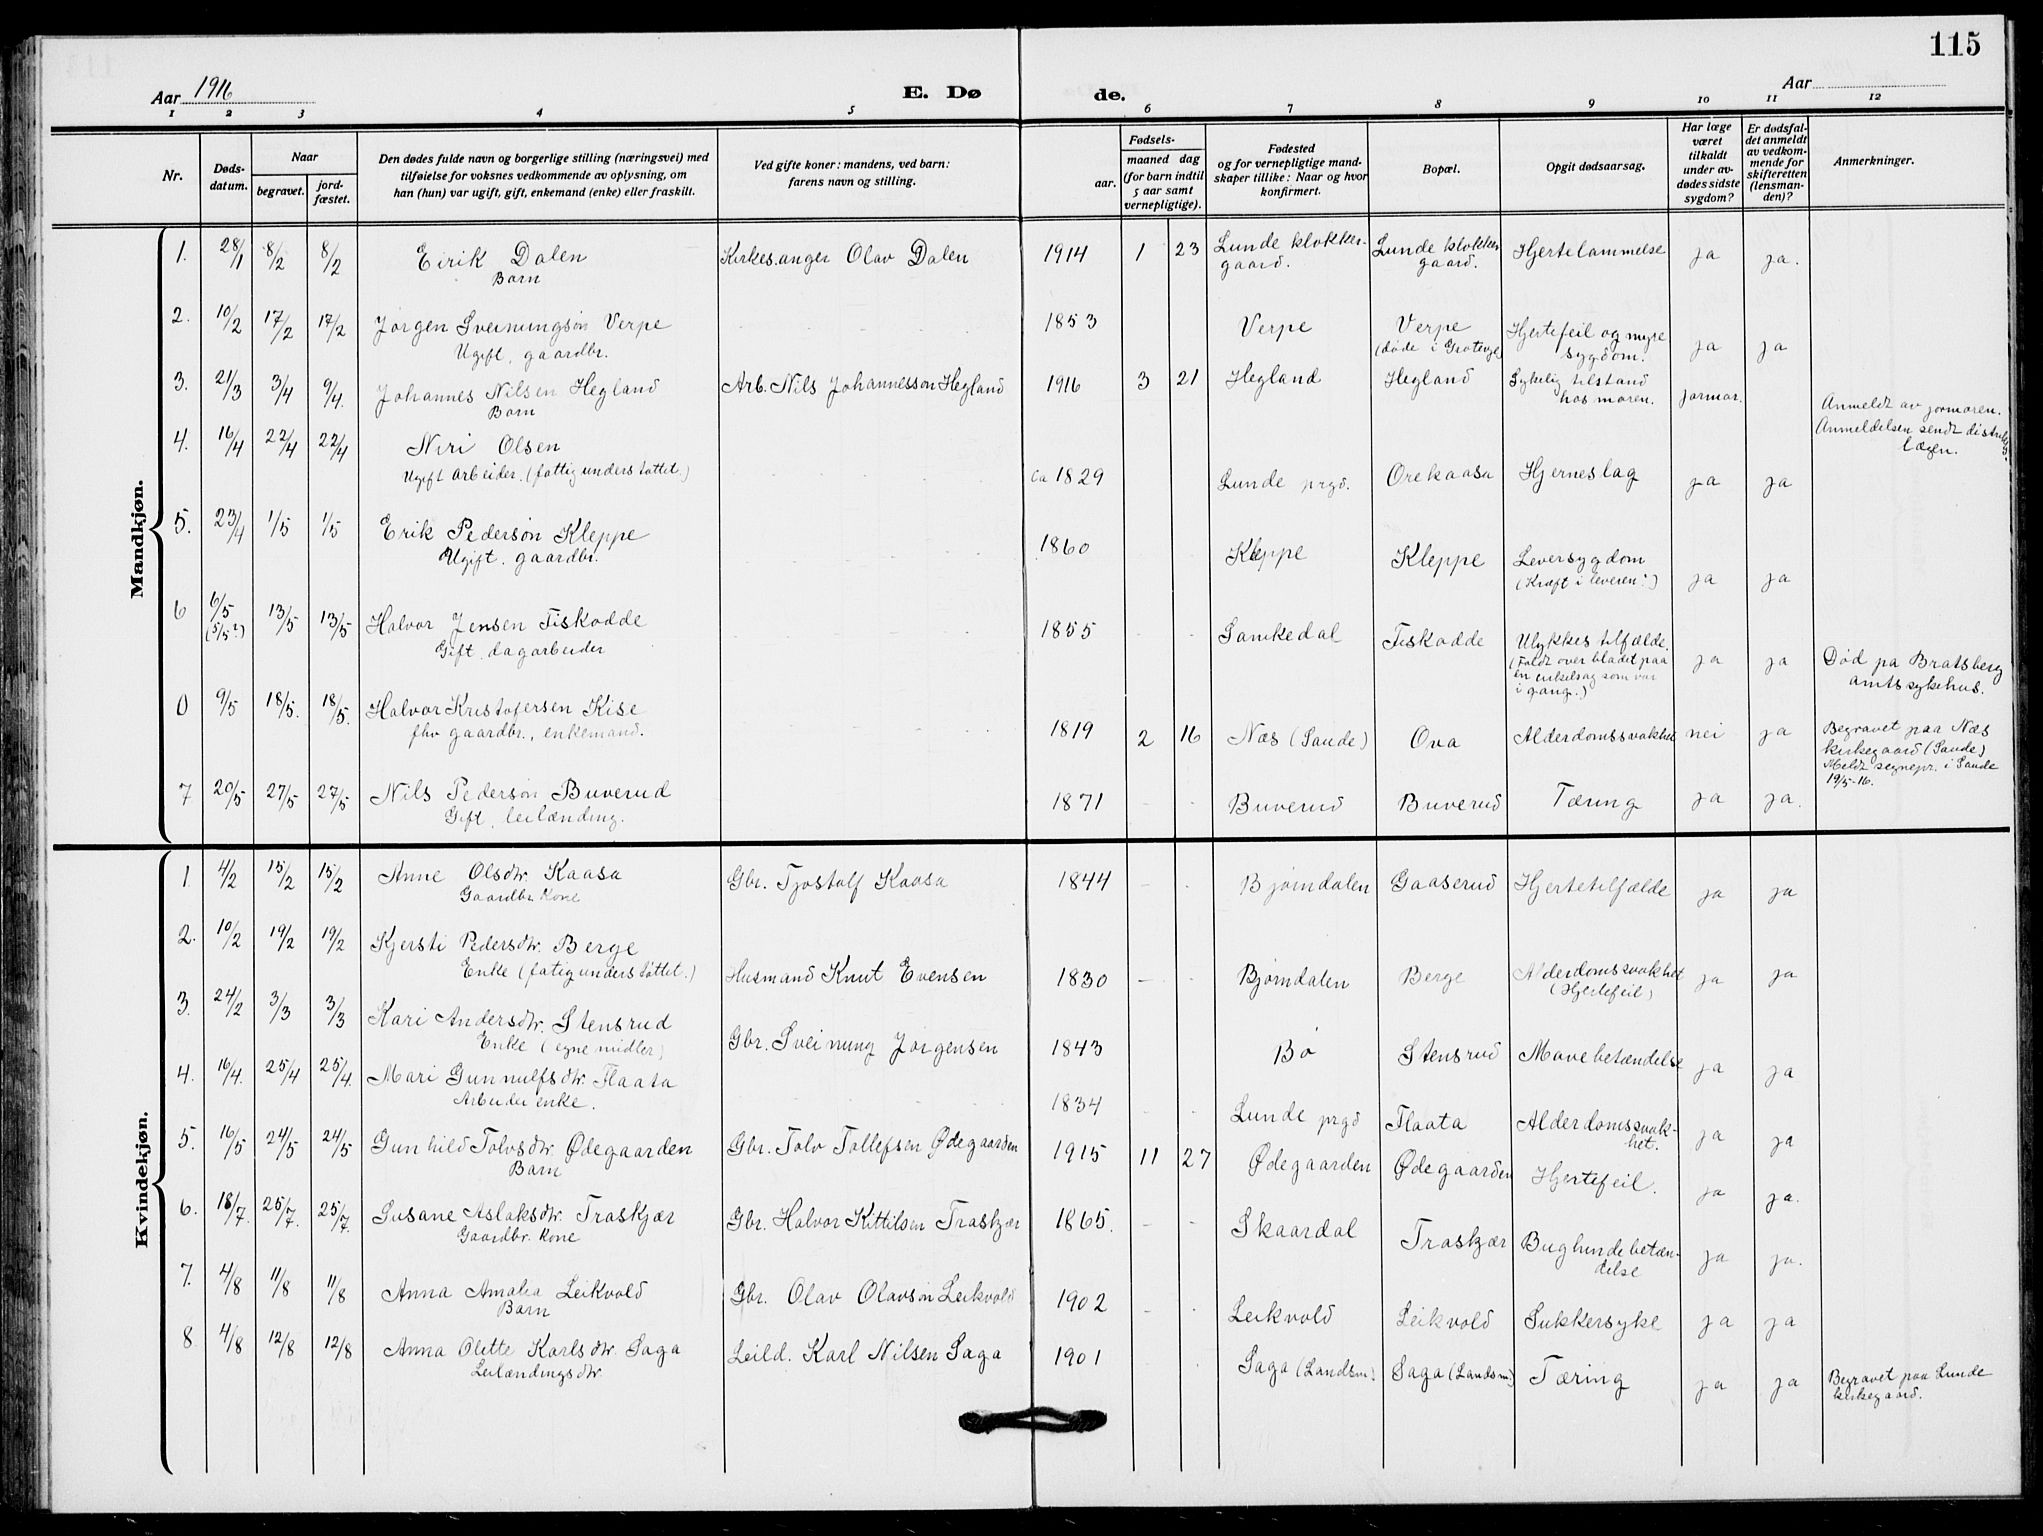 SAKO, Lunde kirkebøker, F/Fa/L0005: Ministerialbok nr. I 5, 1914-1922, s. 115